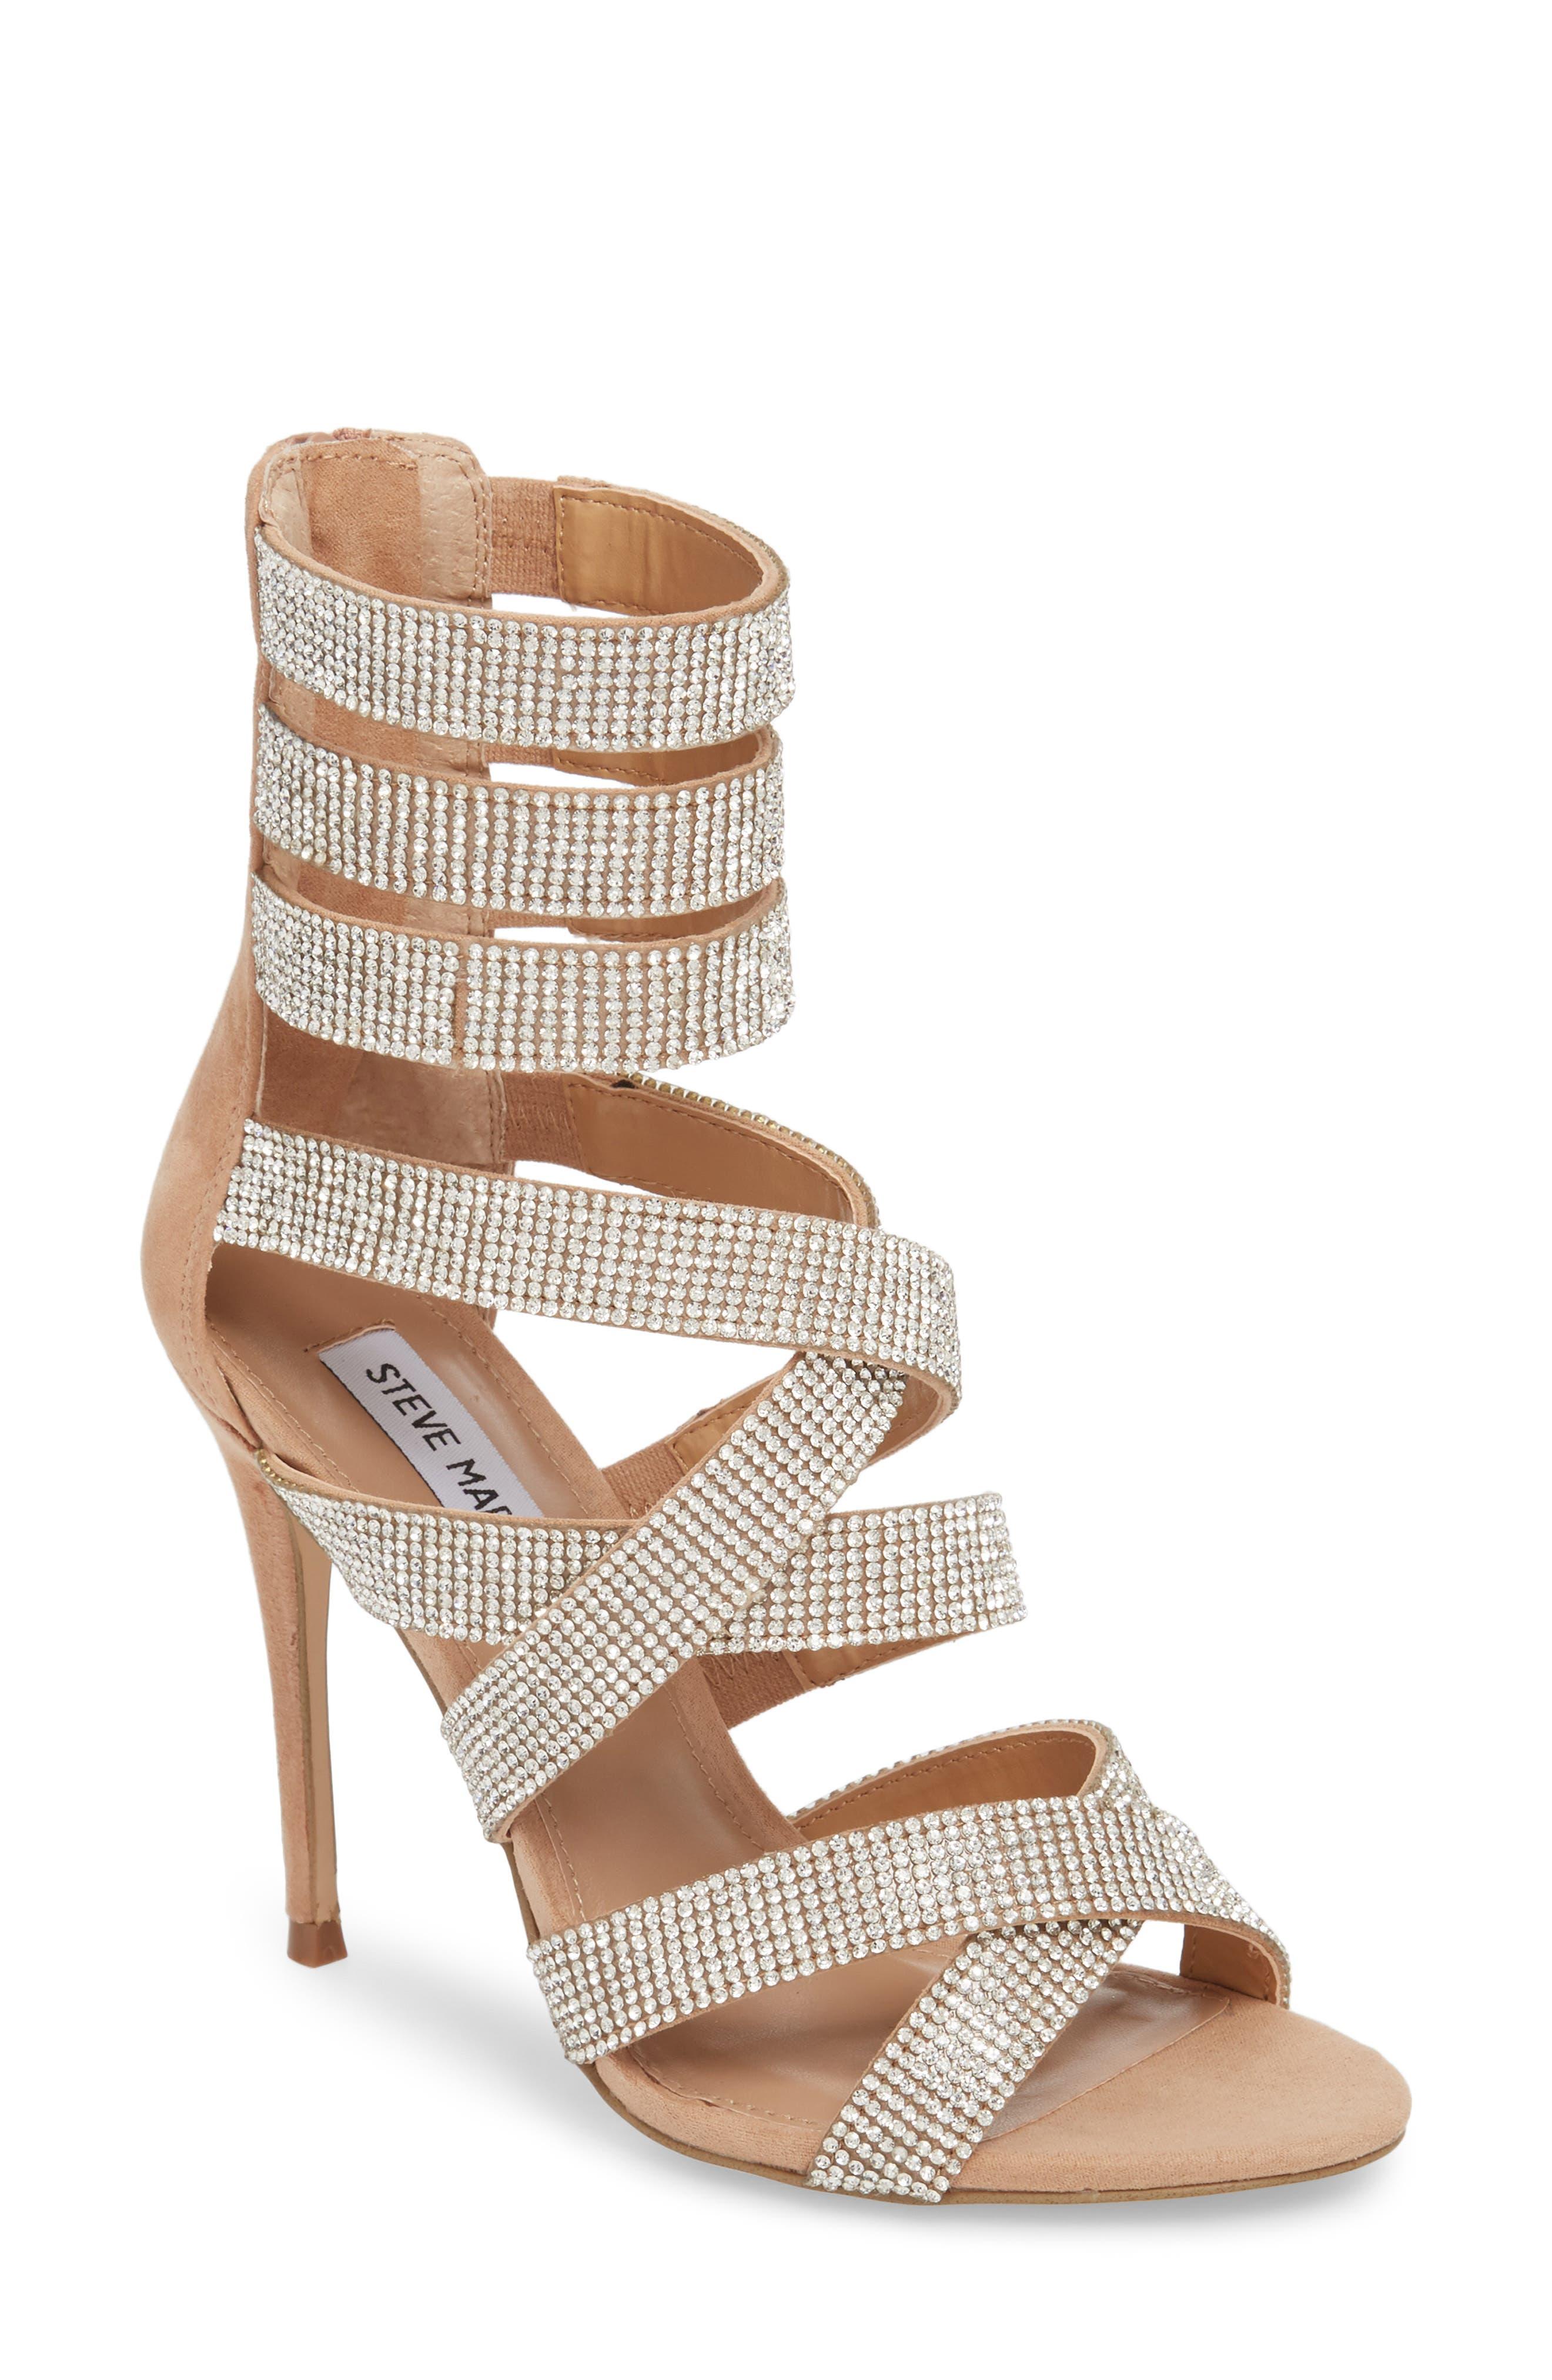 Malika Crystal Embellished Sandal,                         Main,                         color, Rhinestone